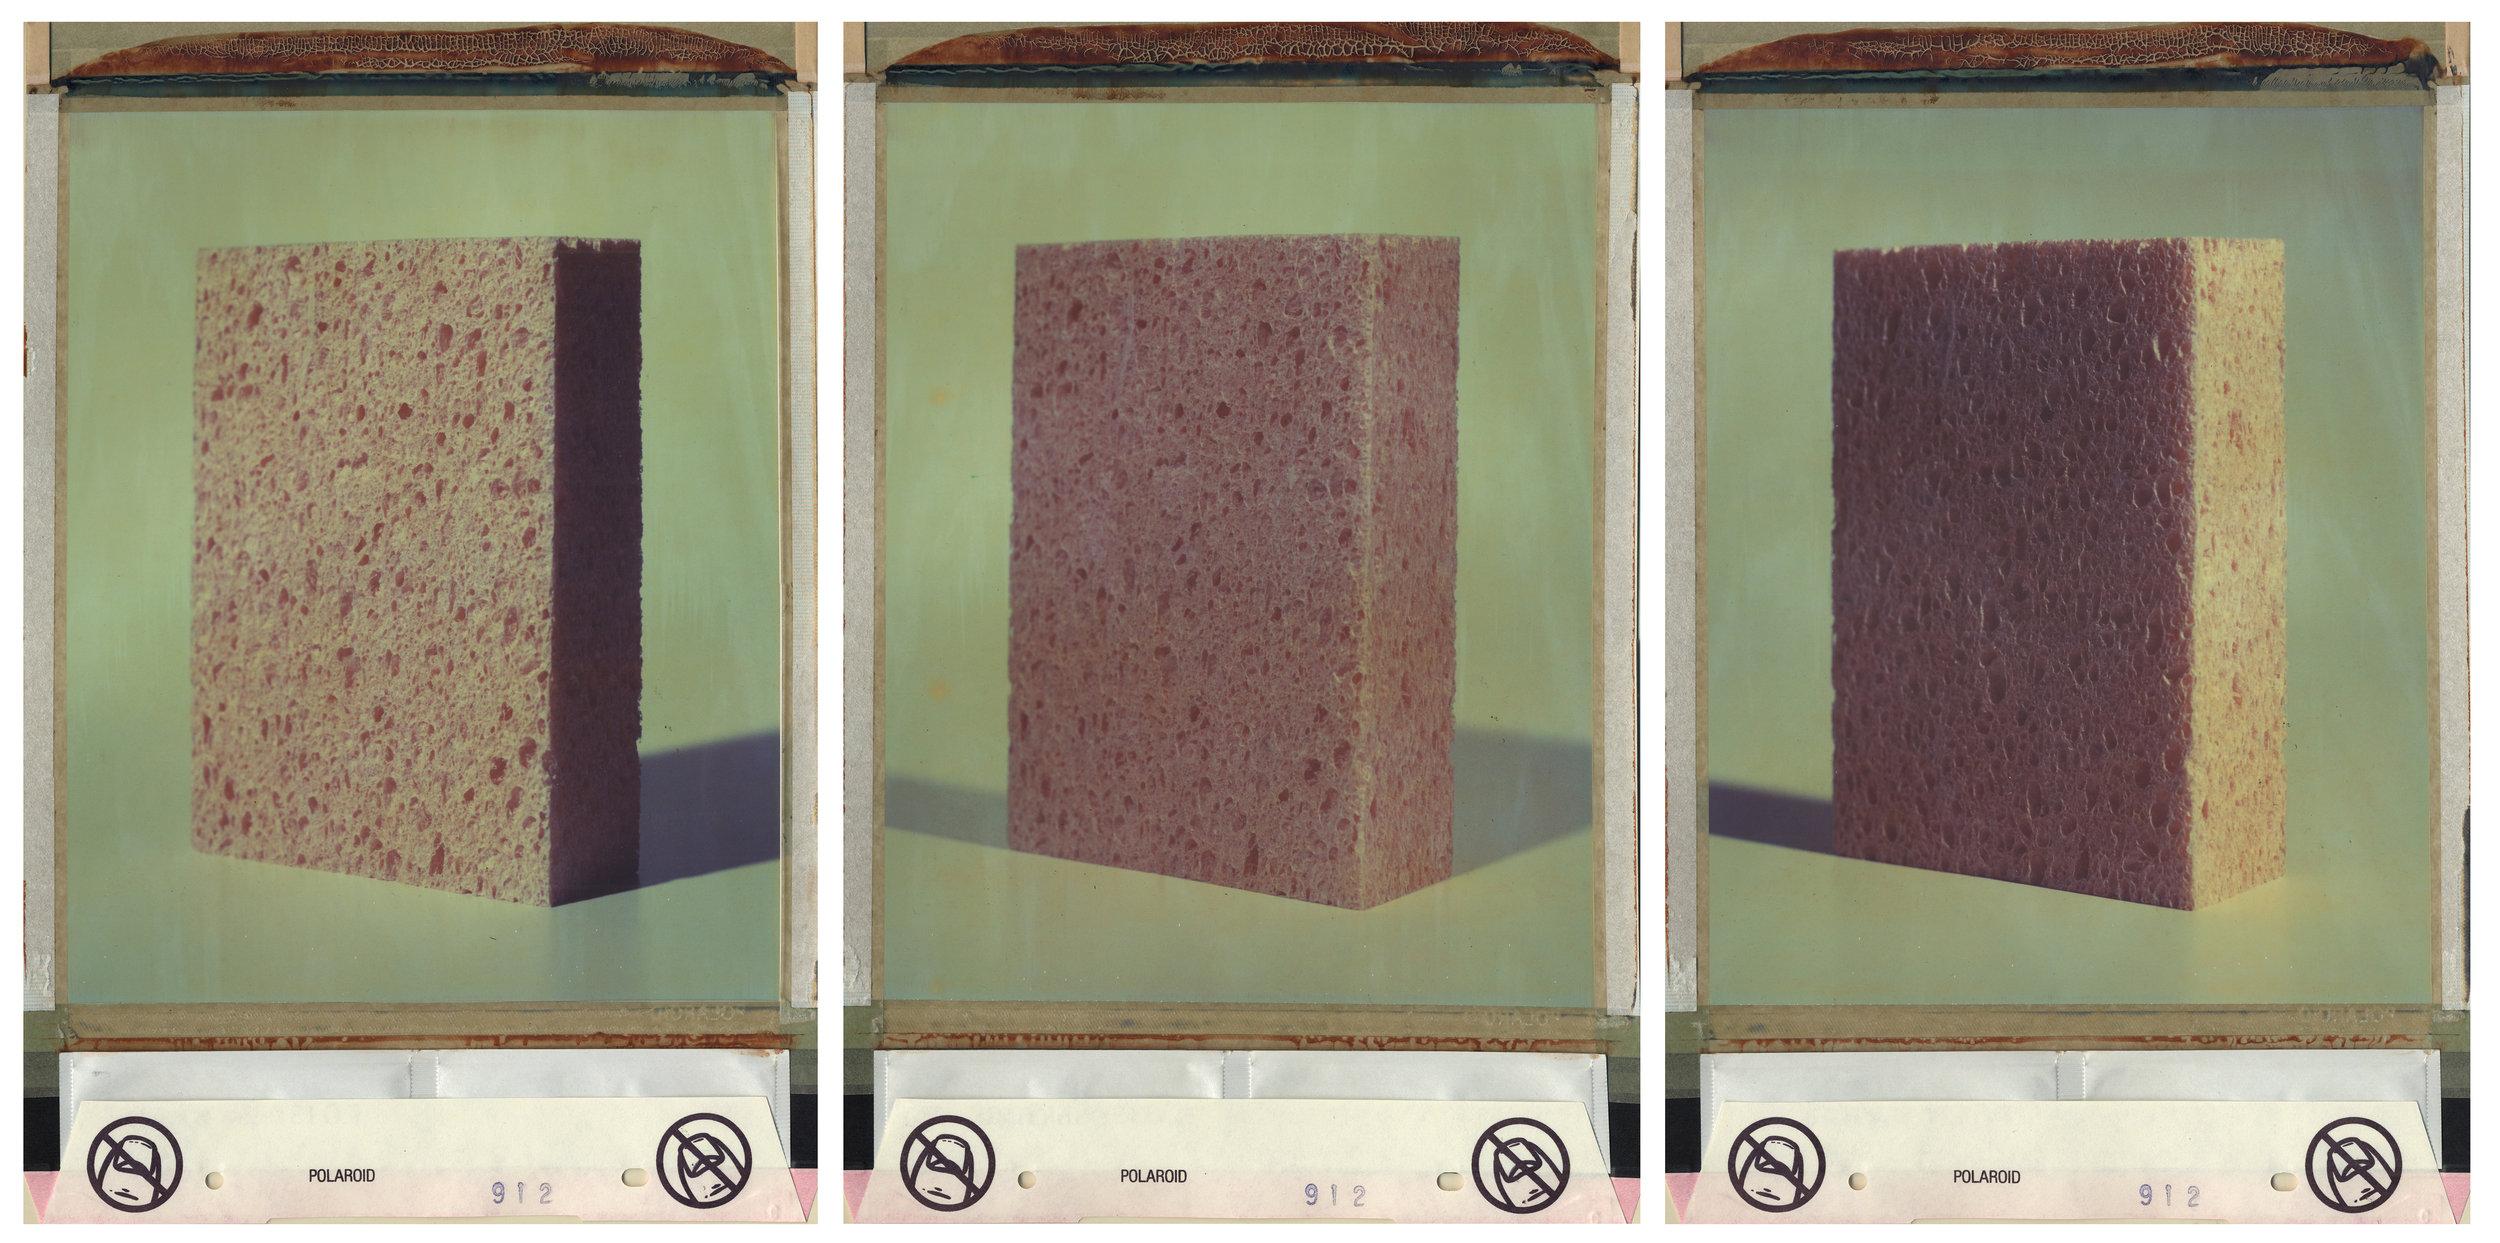 Polaroid L08993639TA  2015  triptych, 8 x 10 color polaroid film  13 x 8 1/2 inches each panel, 13 x 25 ½ inches